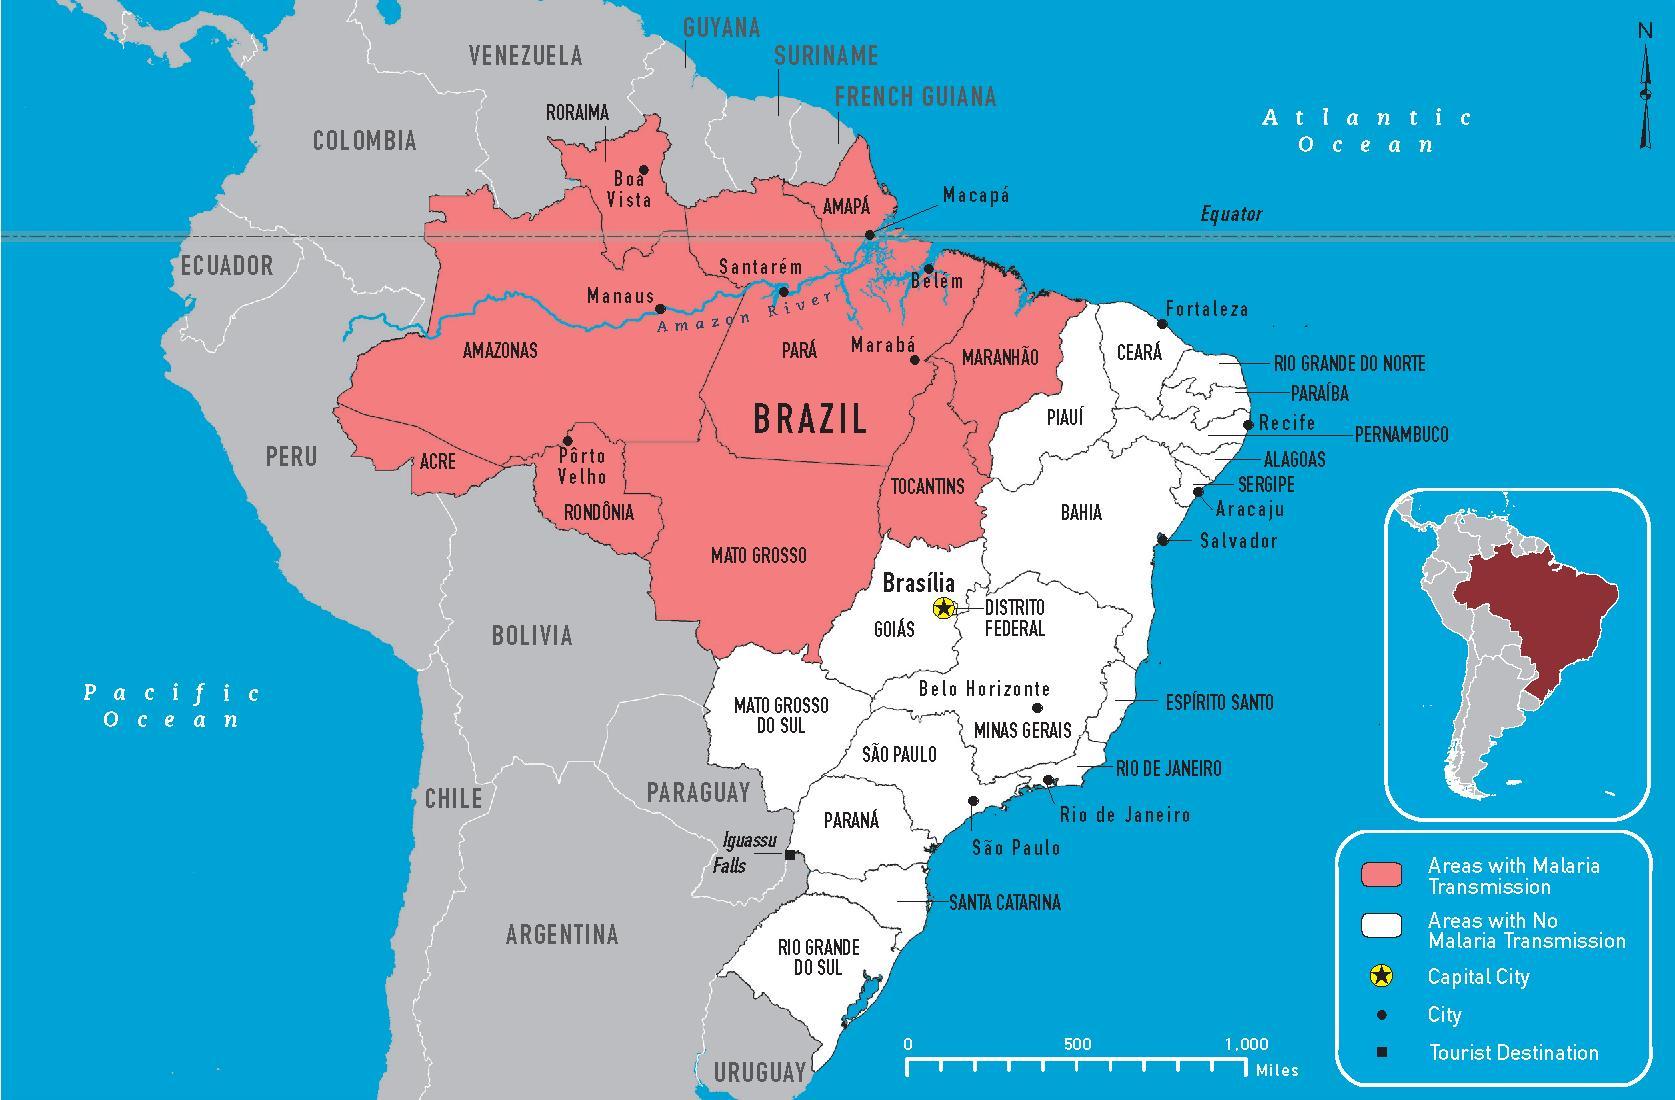 brasilien malaria karte Brasilien malaria anzeigen   Malaria Karte von Brasilien (South